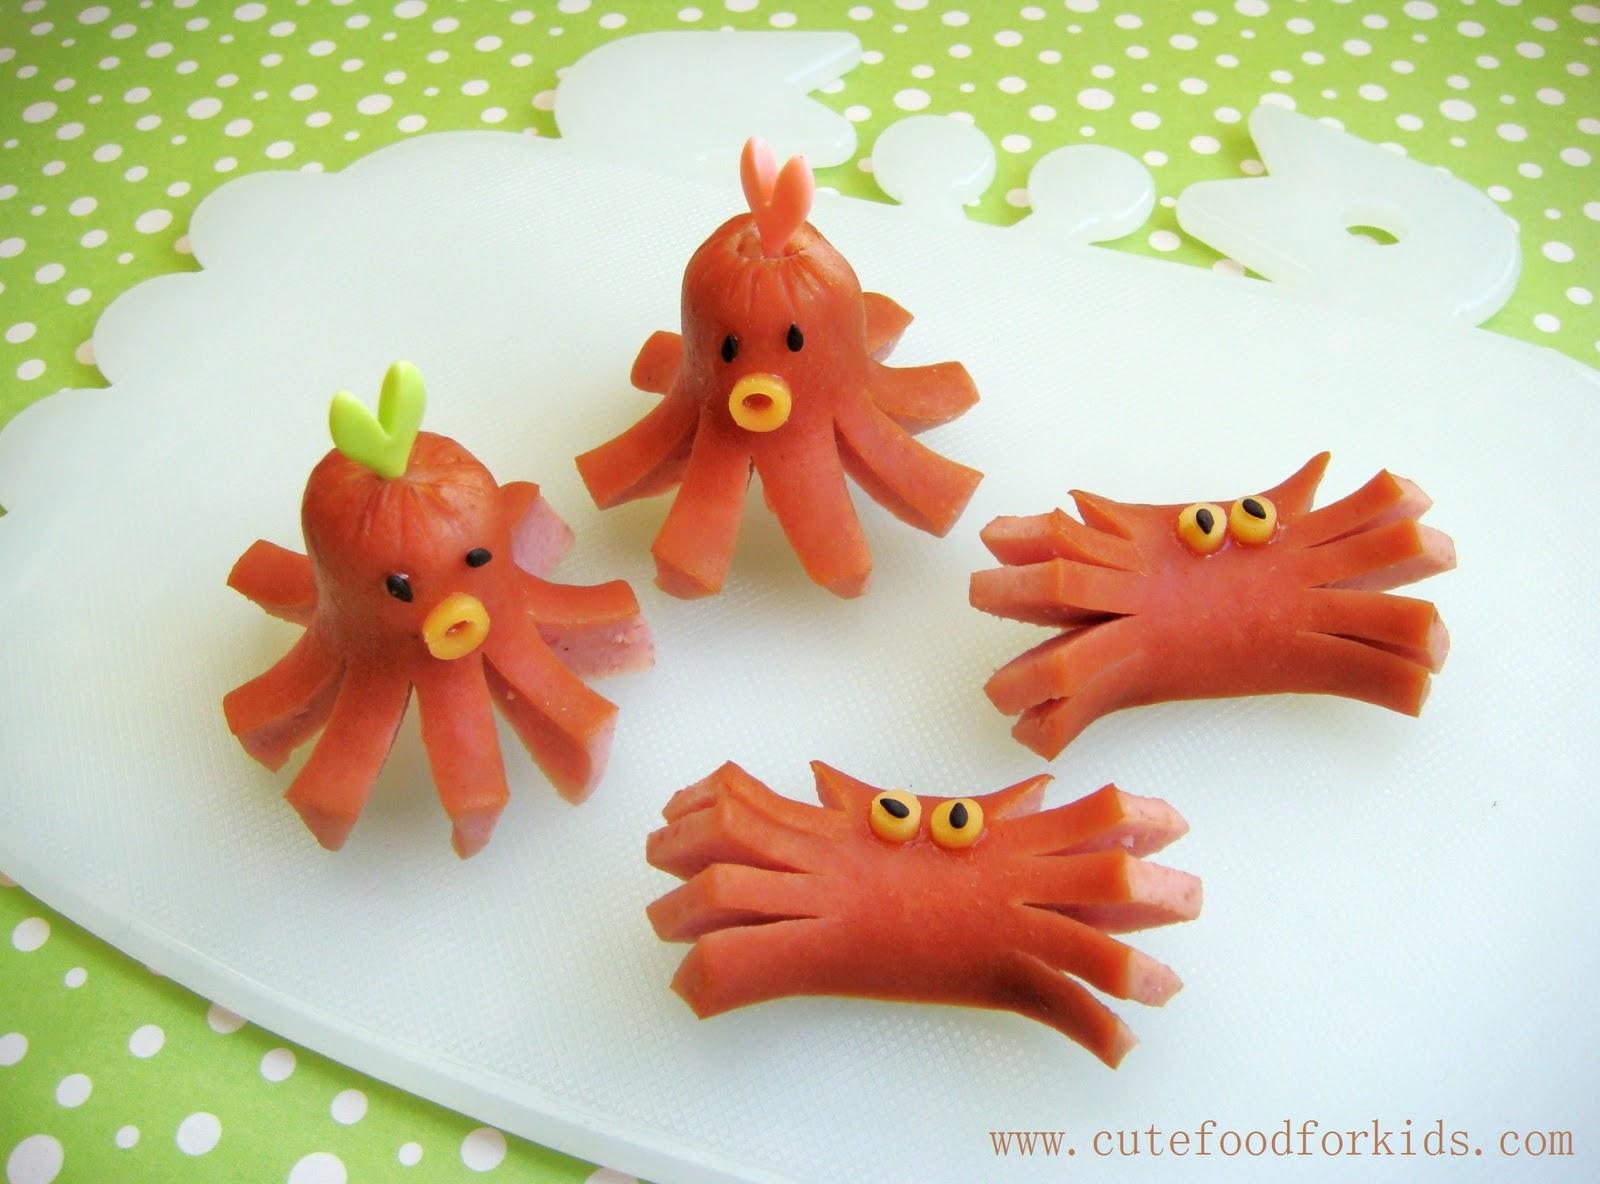 cute food for kids one wiener dog u003d 2 crabs 2 octopi